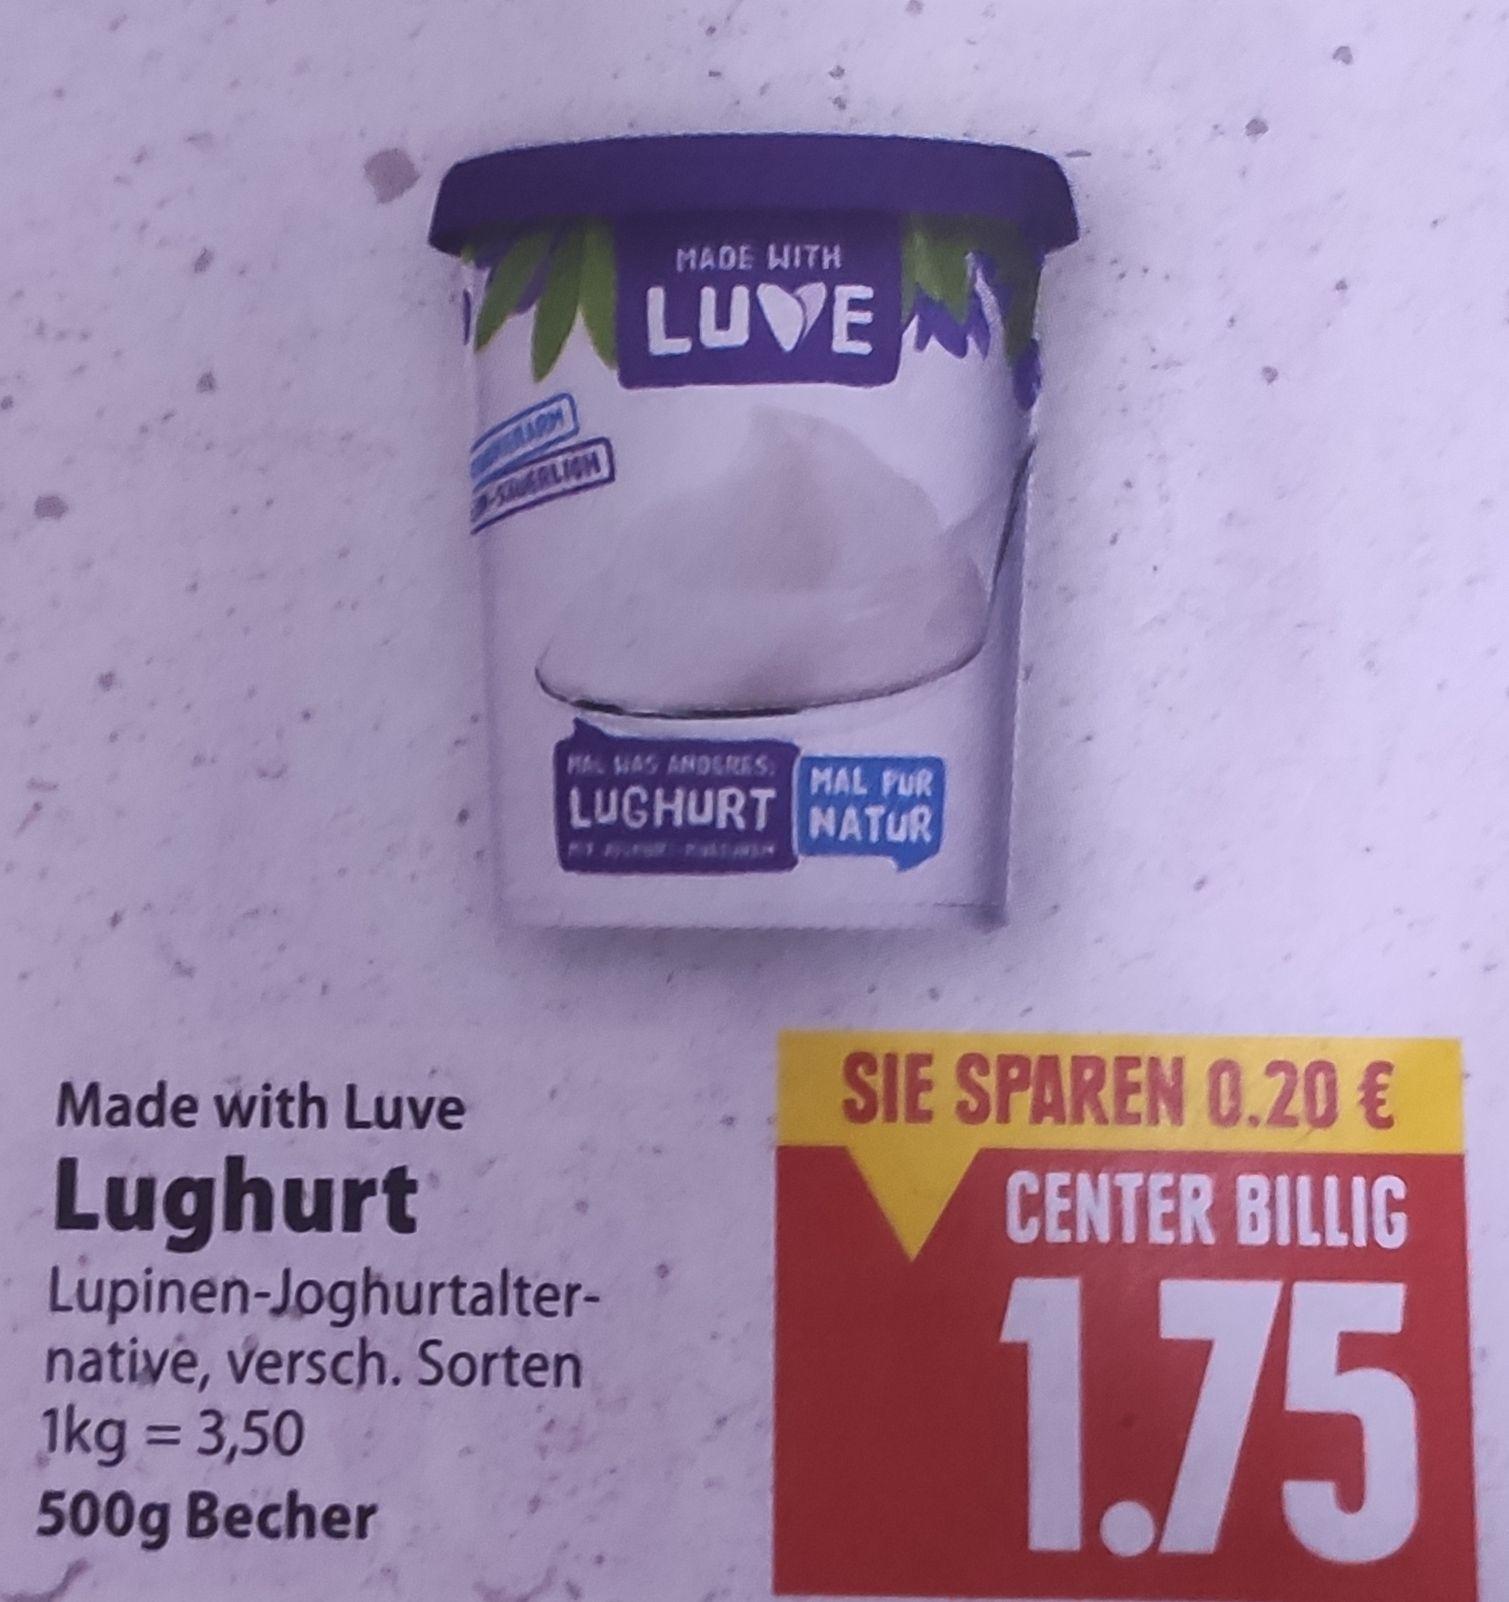 [Edeka Center Minden-Hannover] LUVE Lughurt vegan 500g mit Coupon für 1,25€